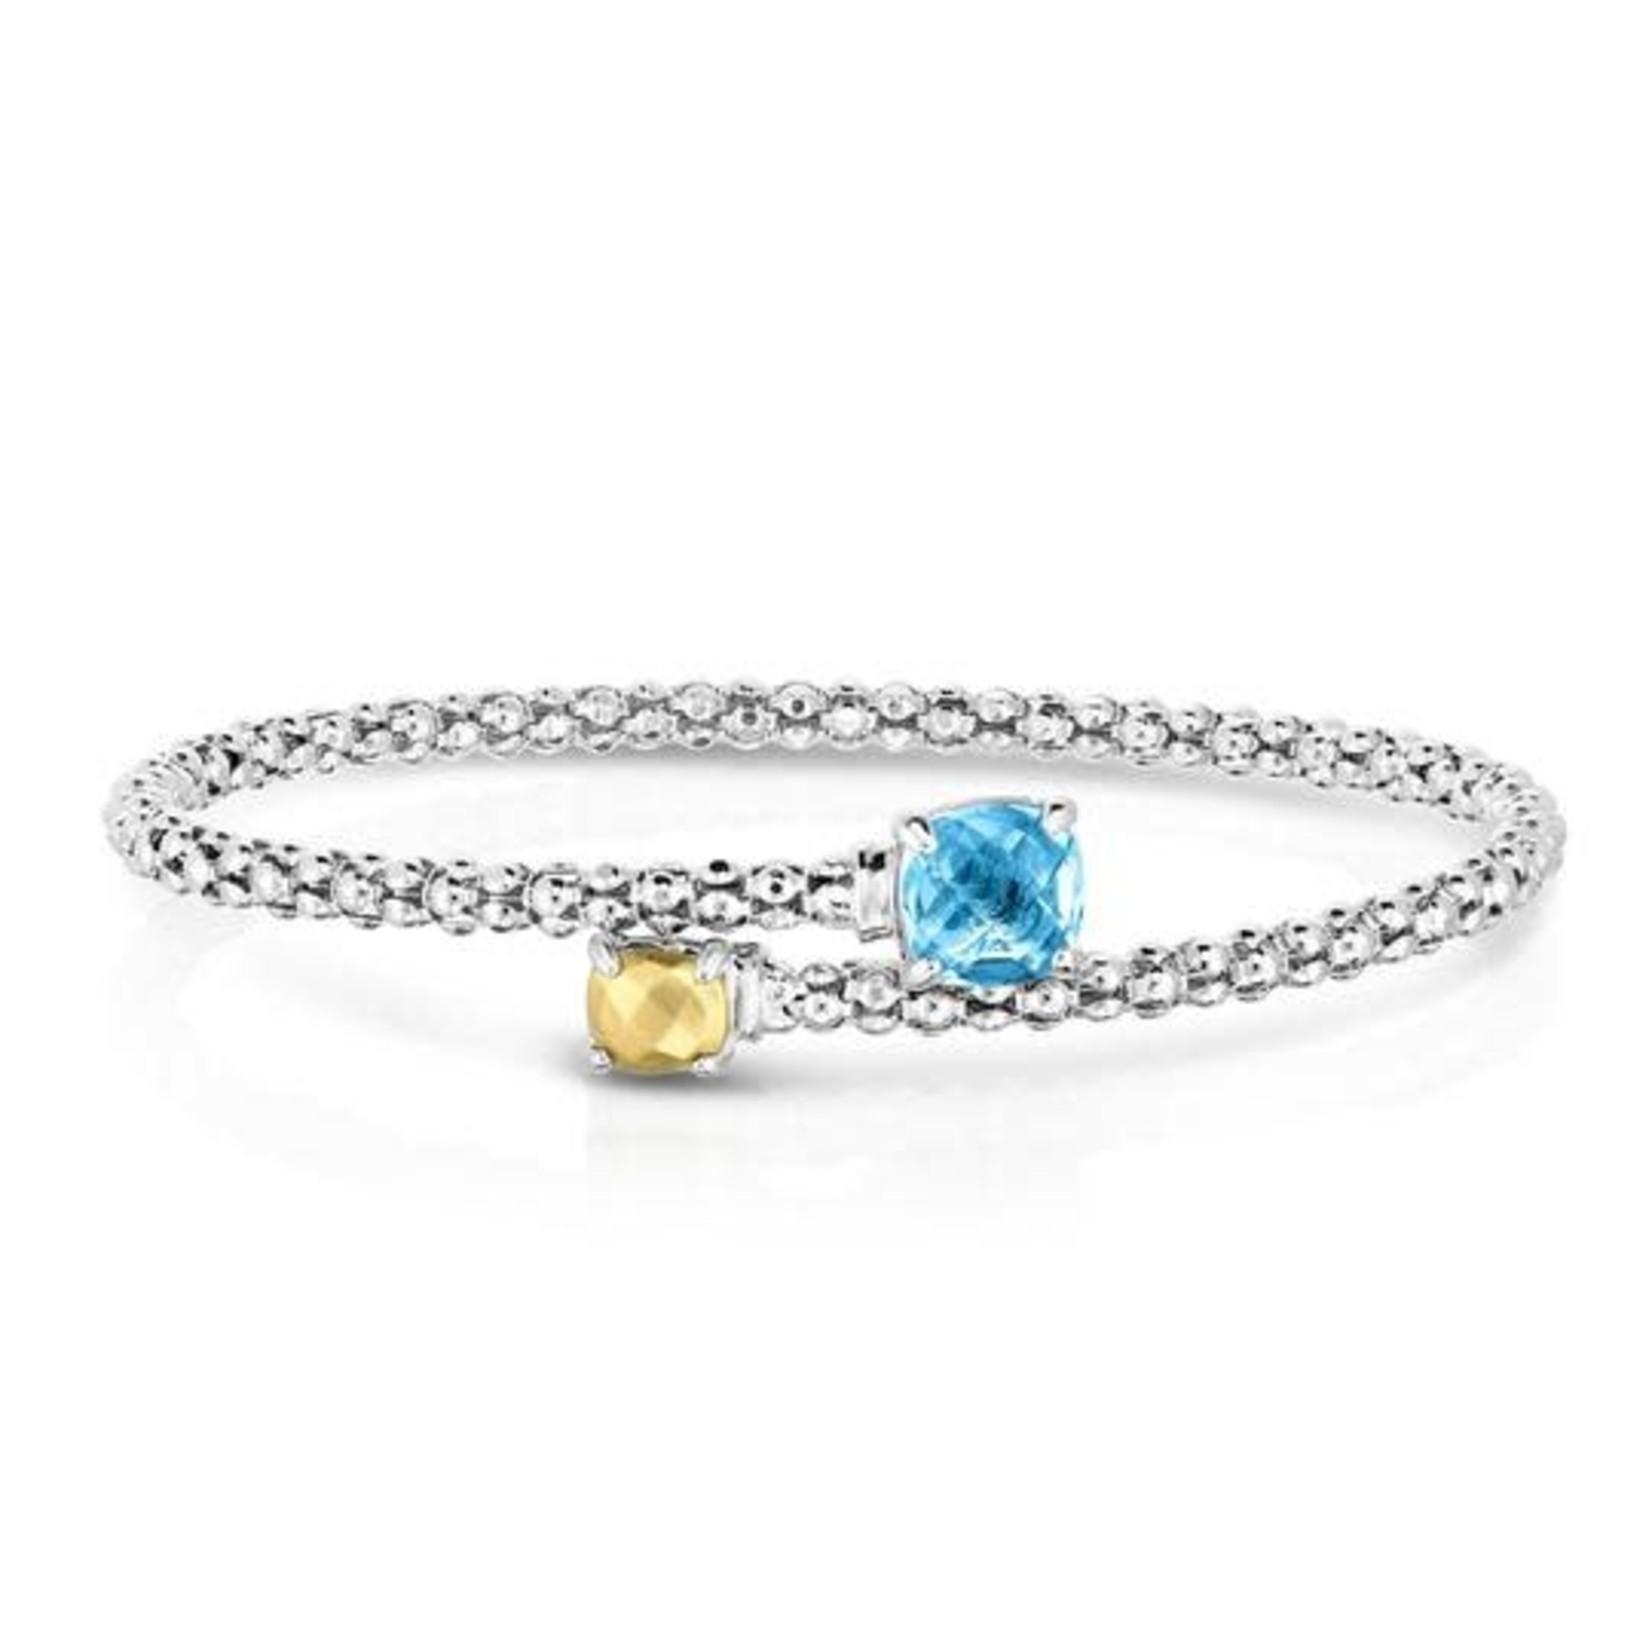 Sterling Silver 18K Gold Blue Topaz Wrap Bracelet